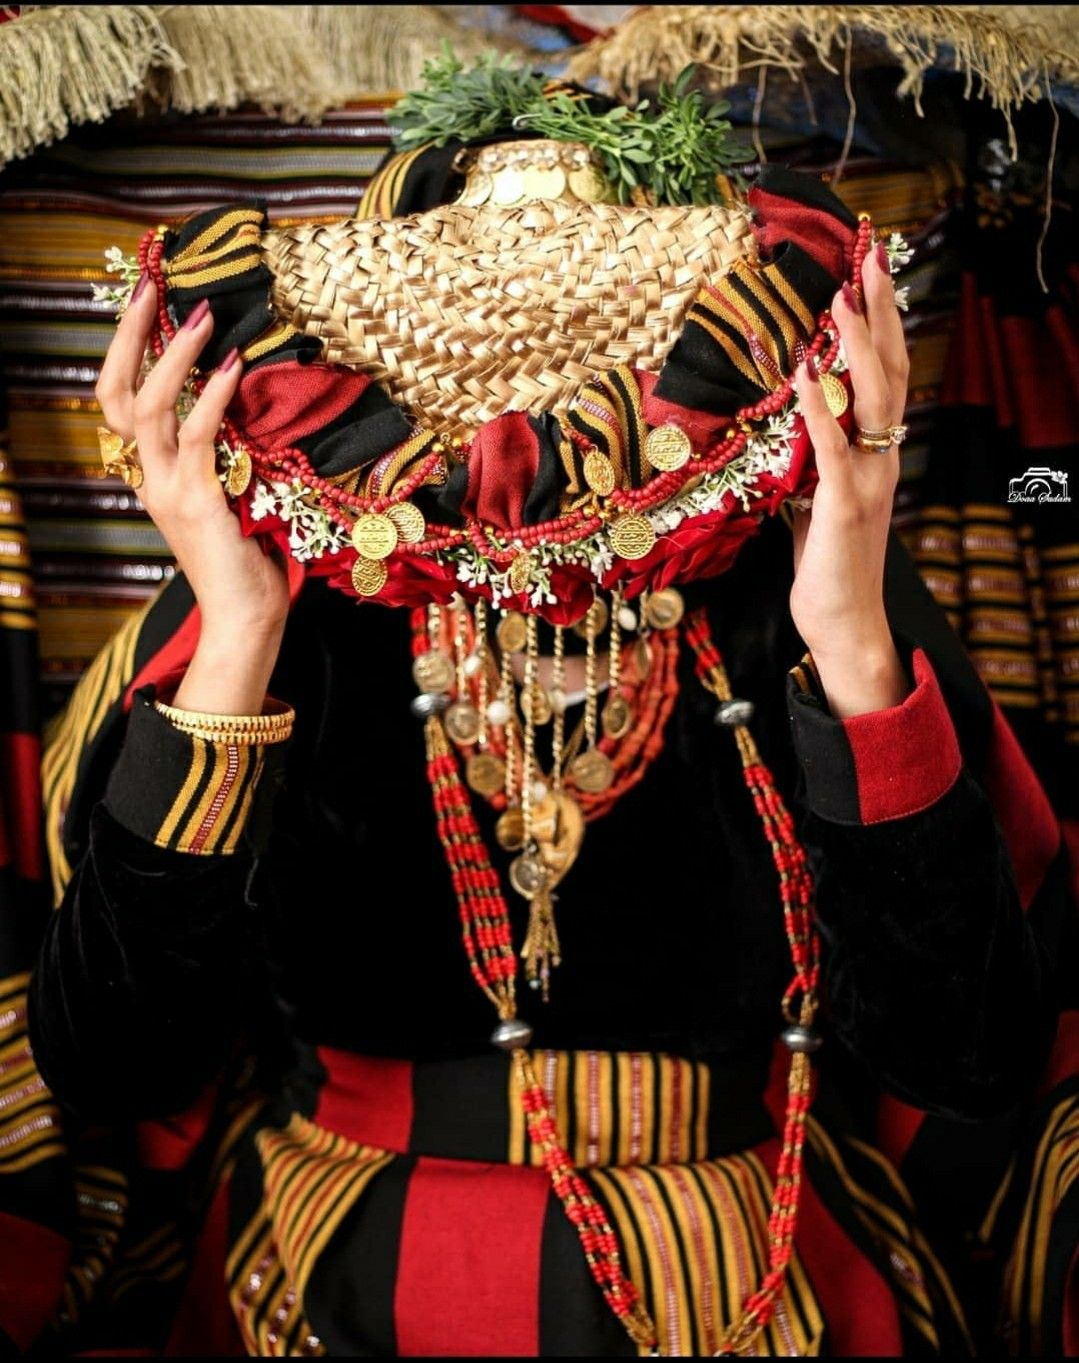 Pin By Amira On Yemeni Yemen Women Simple Bridal Jewelry Afghani Clothes